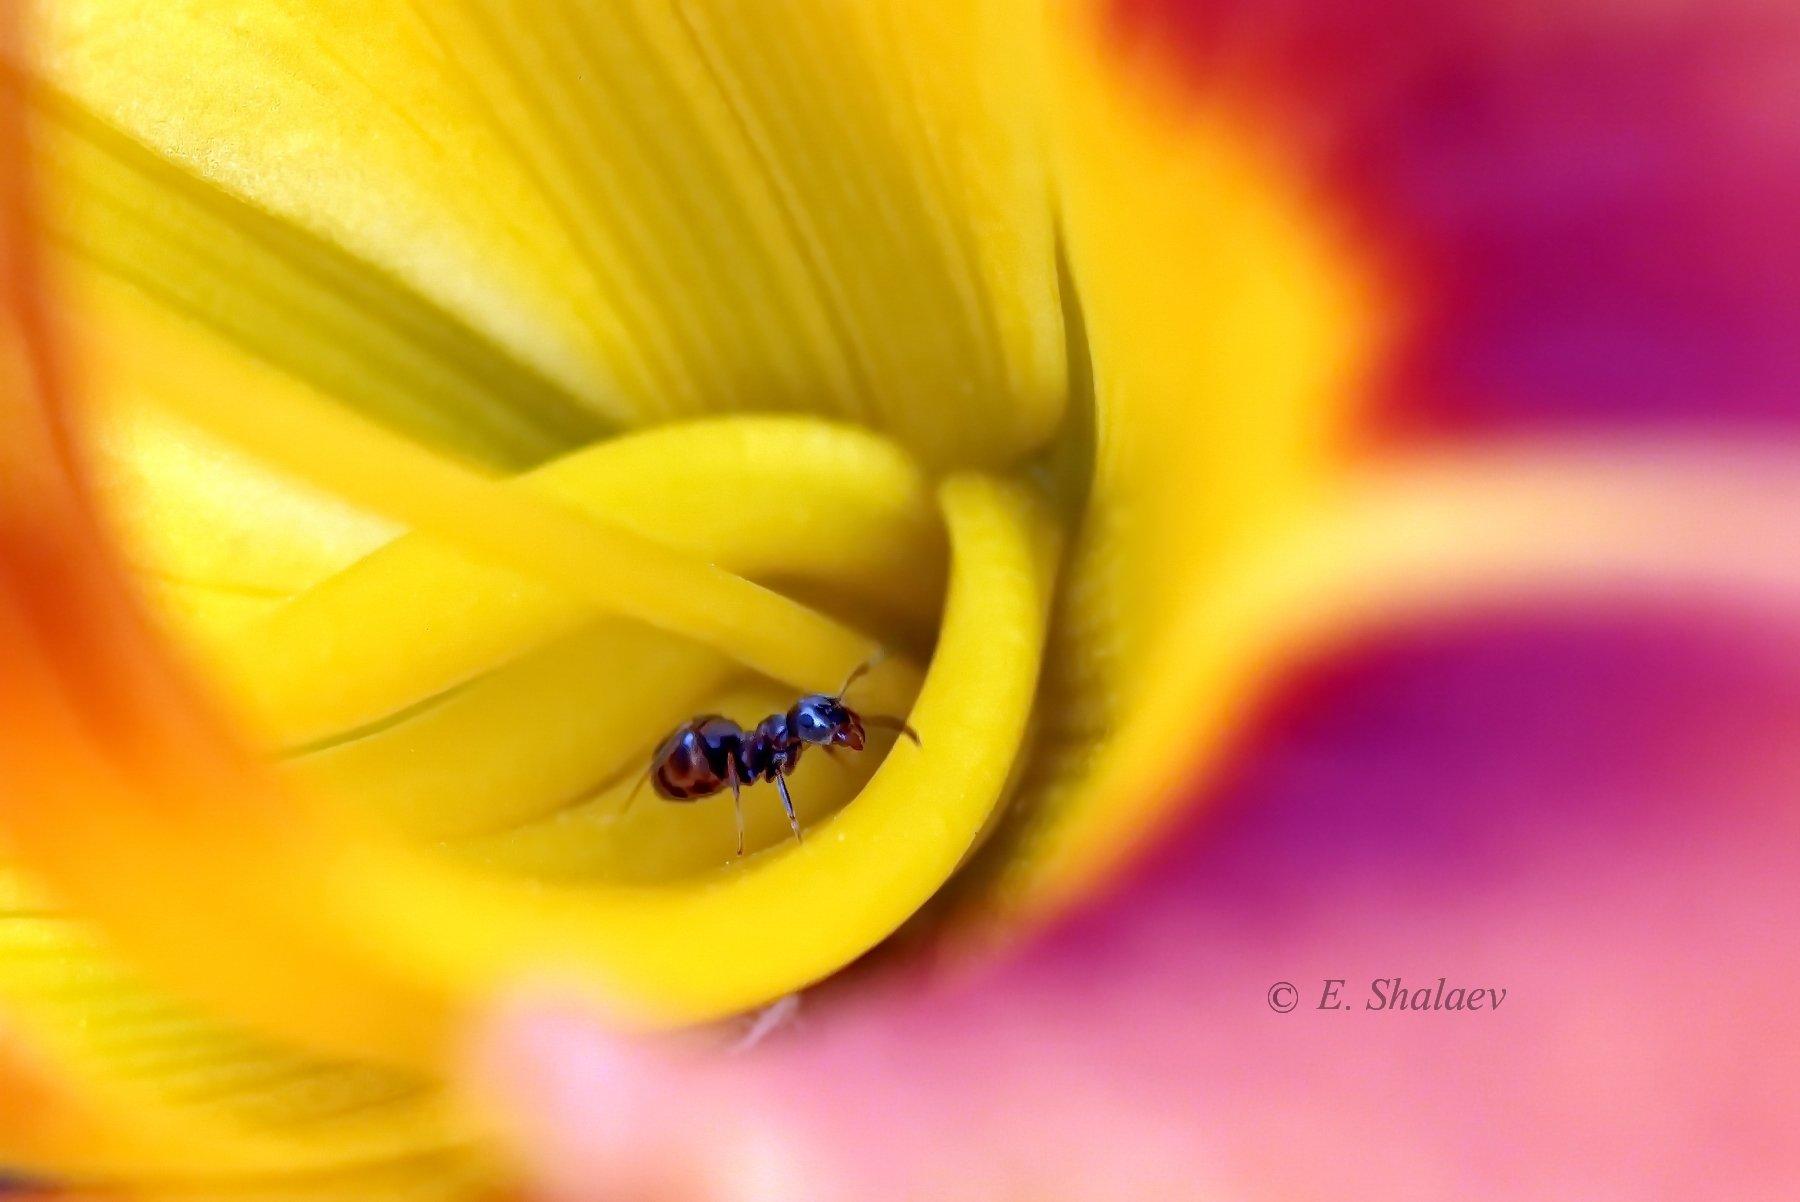 цветок,муравей,макро, Евгений